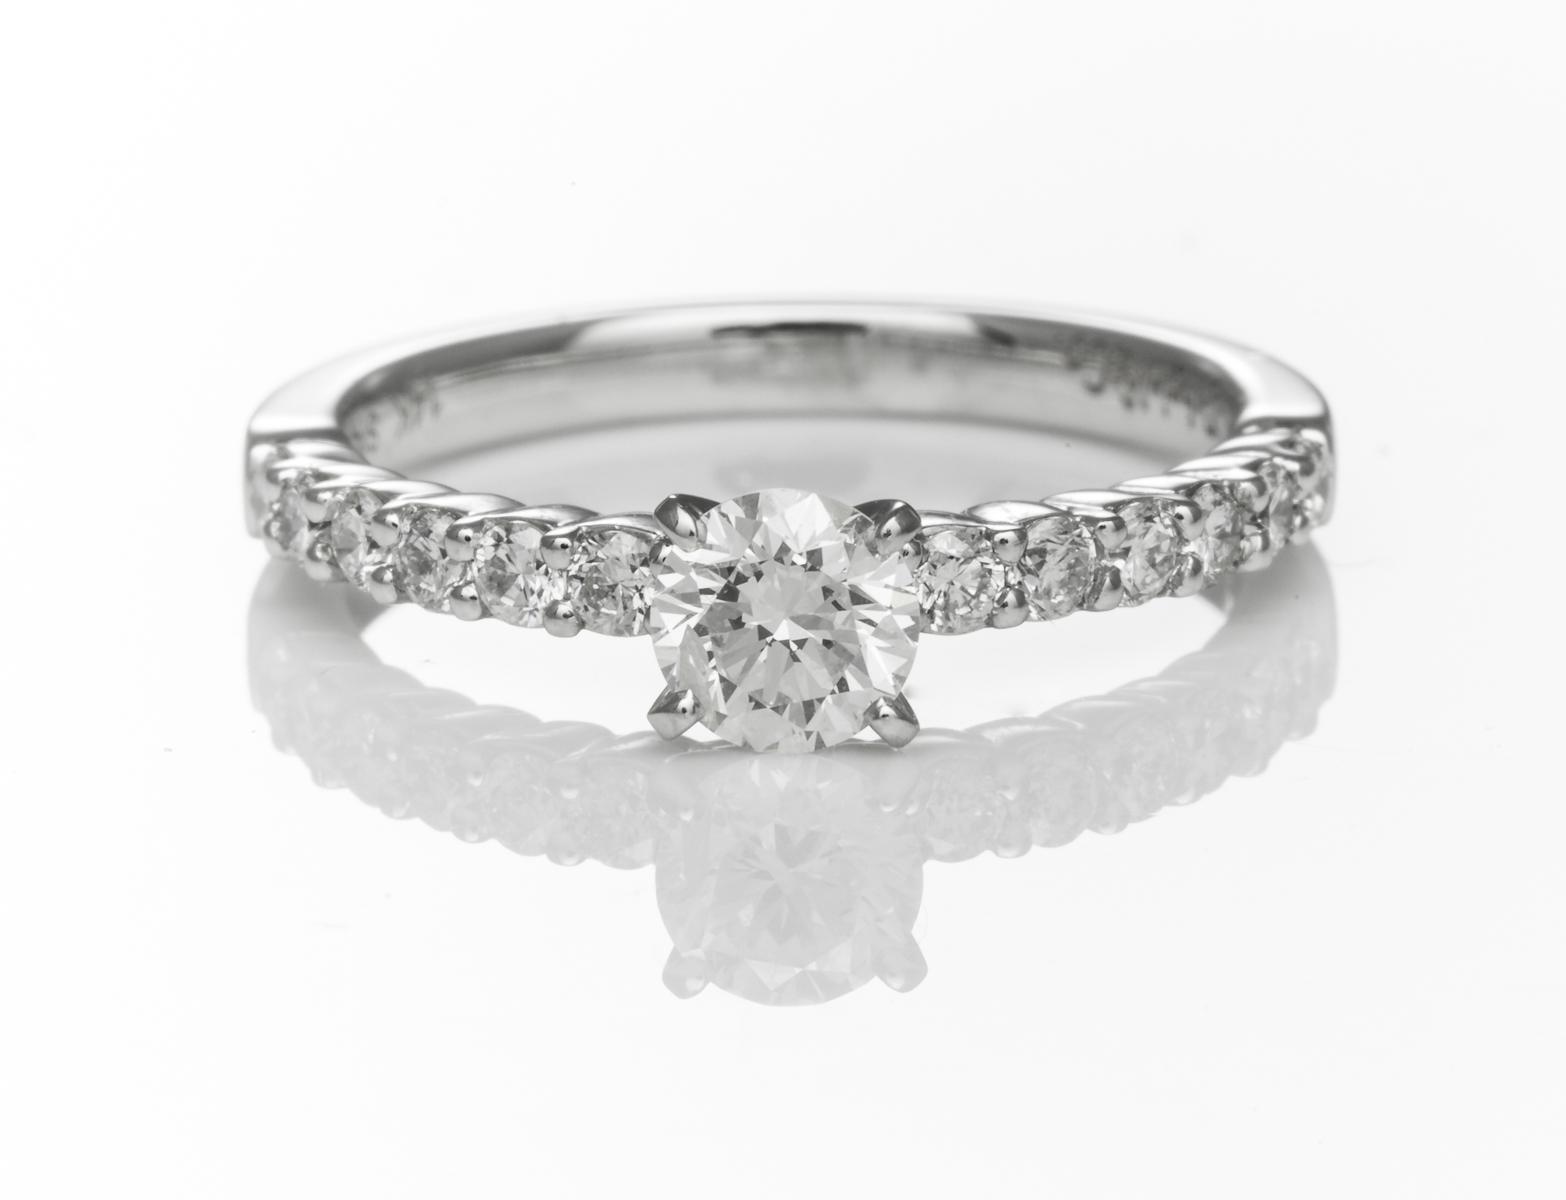 Round Brilliant Cut Diamond Solitaire Ring Within Solitaire Round Brilliant Engagement Rings (Gallery 22 of 25)